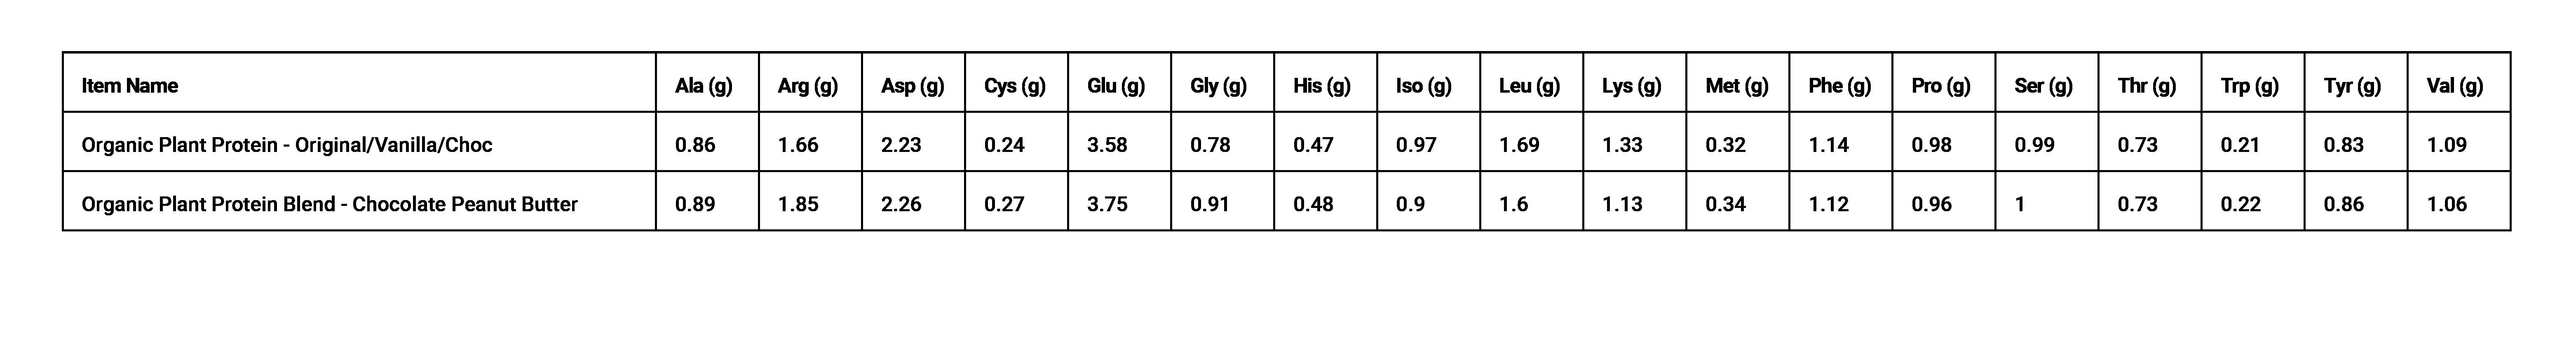 Organic Plant Protein AminoAcids